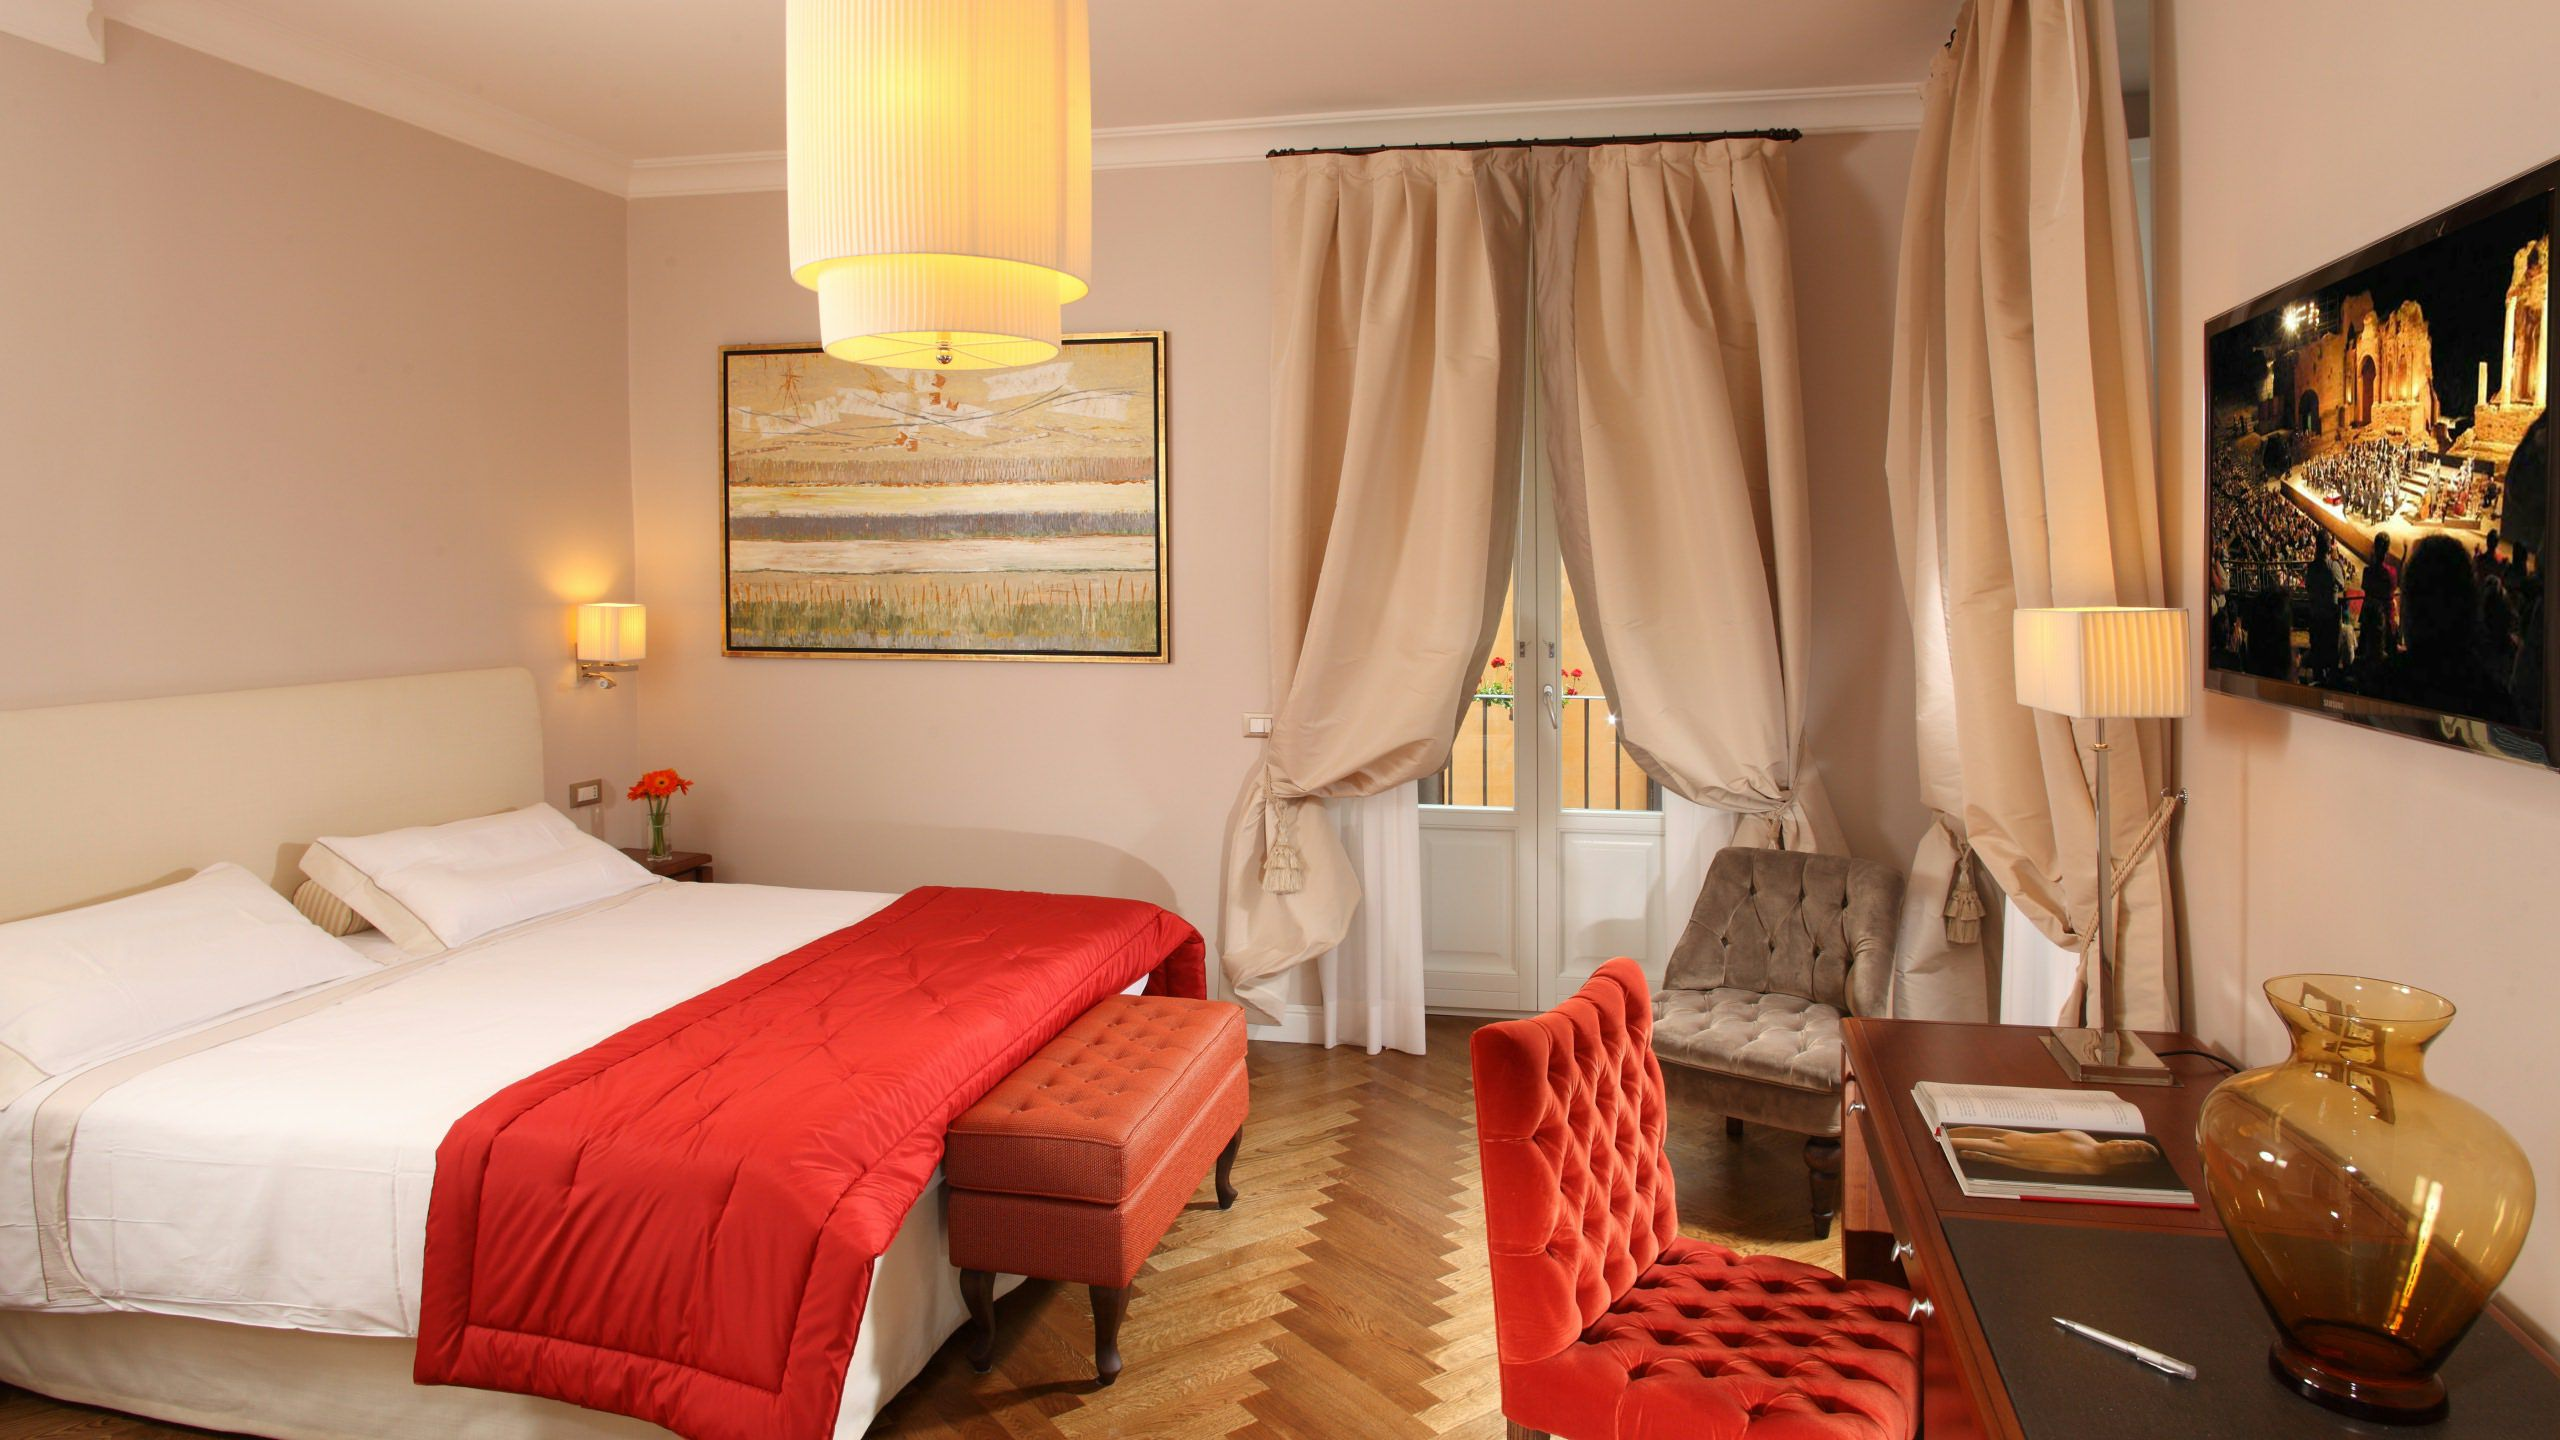 Hotel-Vivaldi-Roma-camera-elegance-13